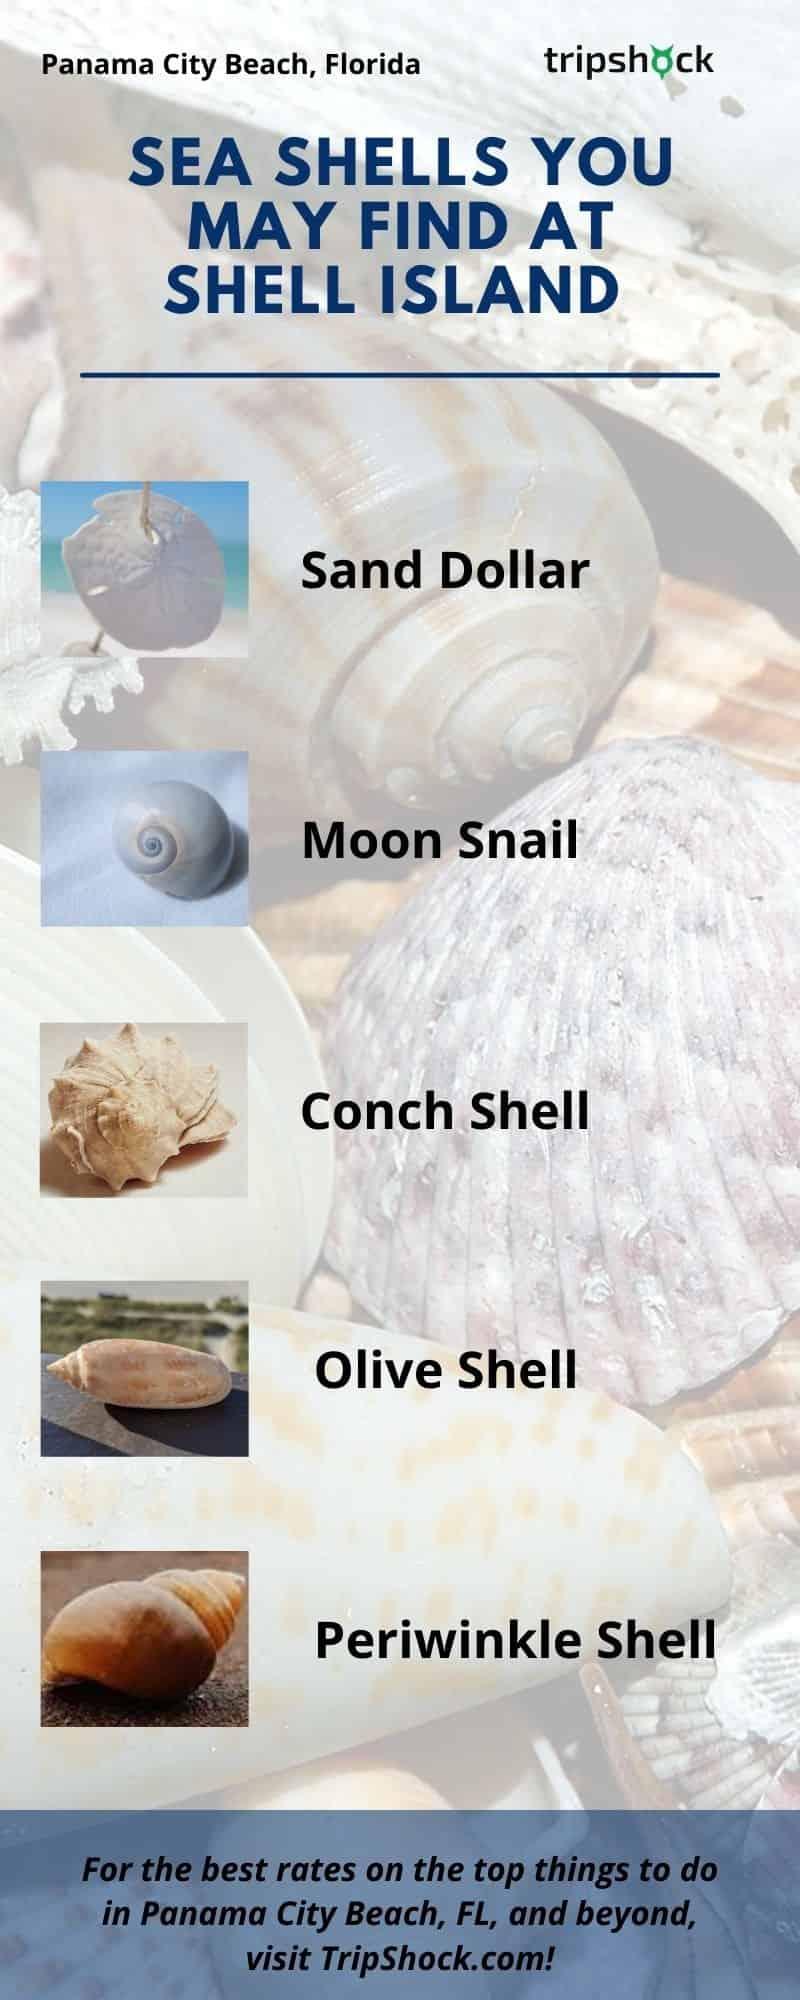 Sea Shells You May Find at Shell Island